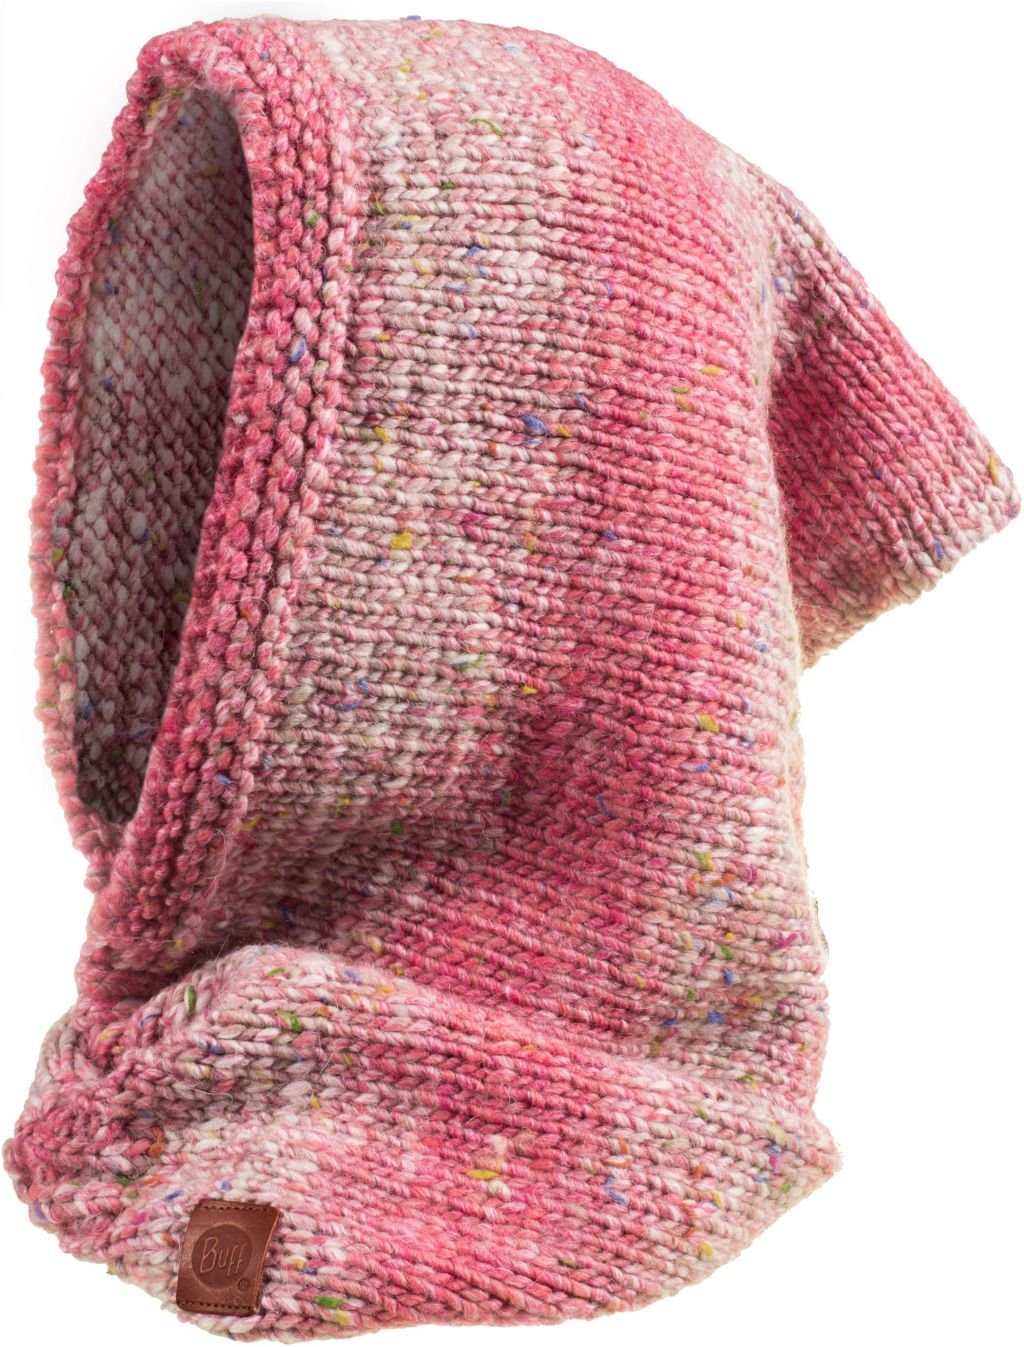 Damenmode Online Gnstig Kaufen Ber Shop24at Shop24 Buff Bandana Outwear Loop